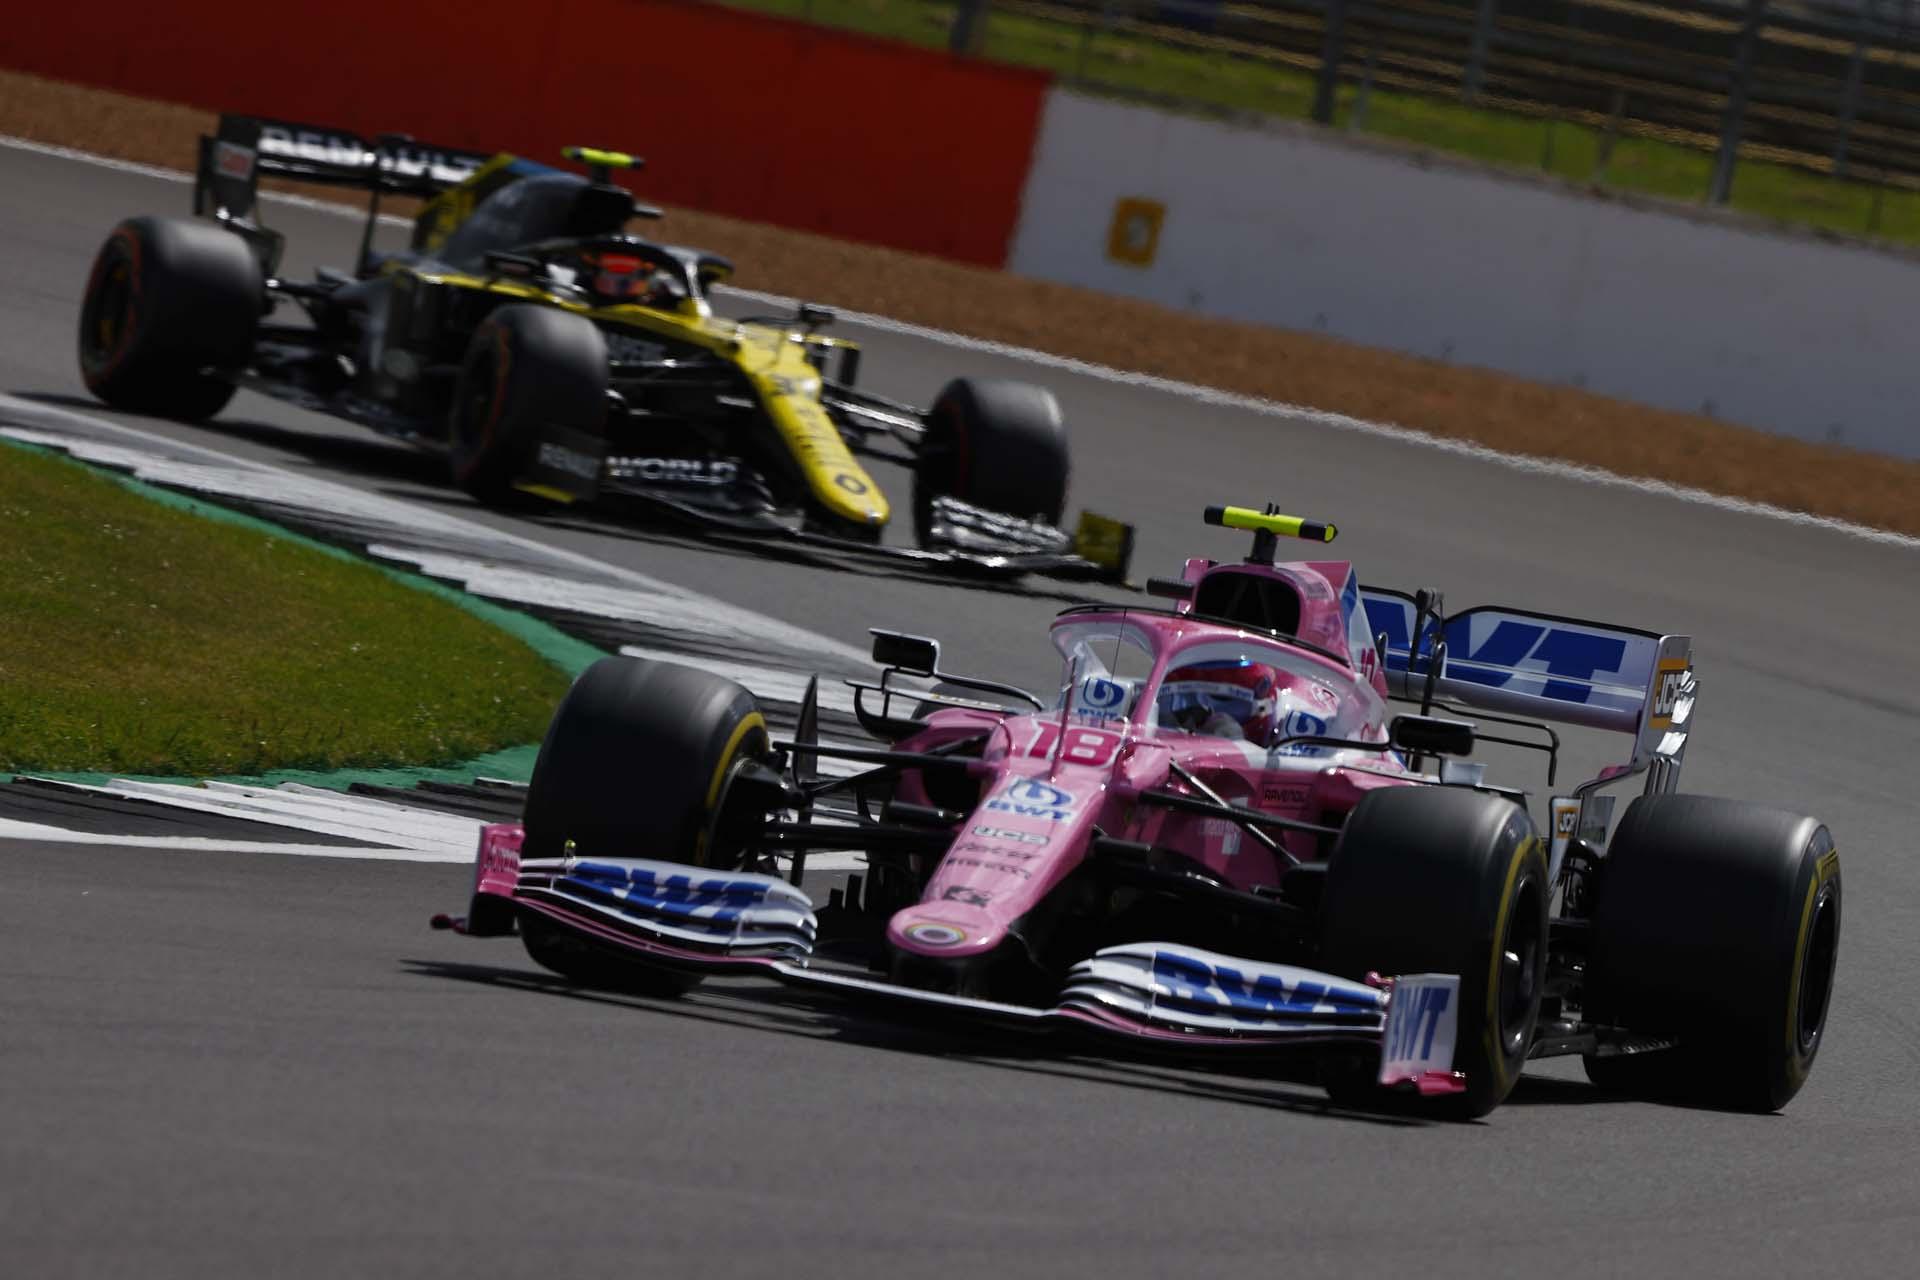 Lance Stroll, Racing Point RP20, leads Esteban Ocon, Renault R.S.20